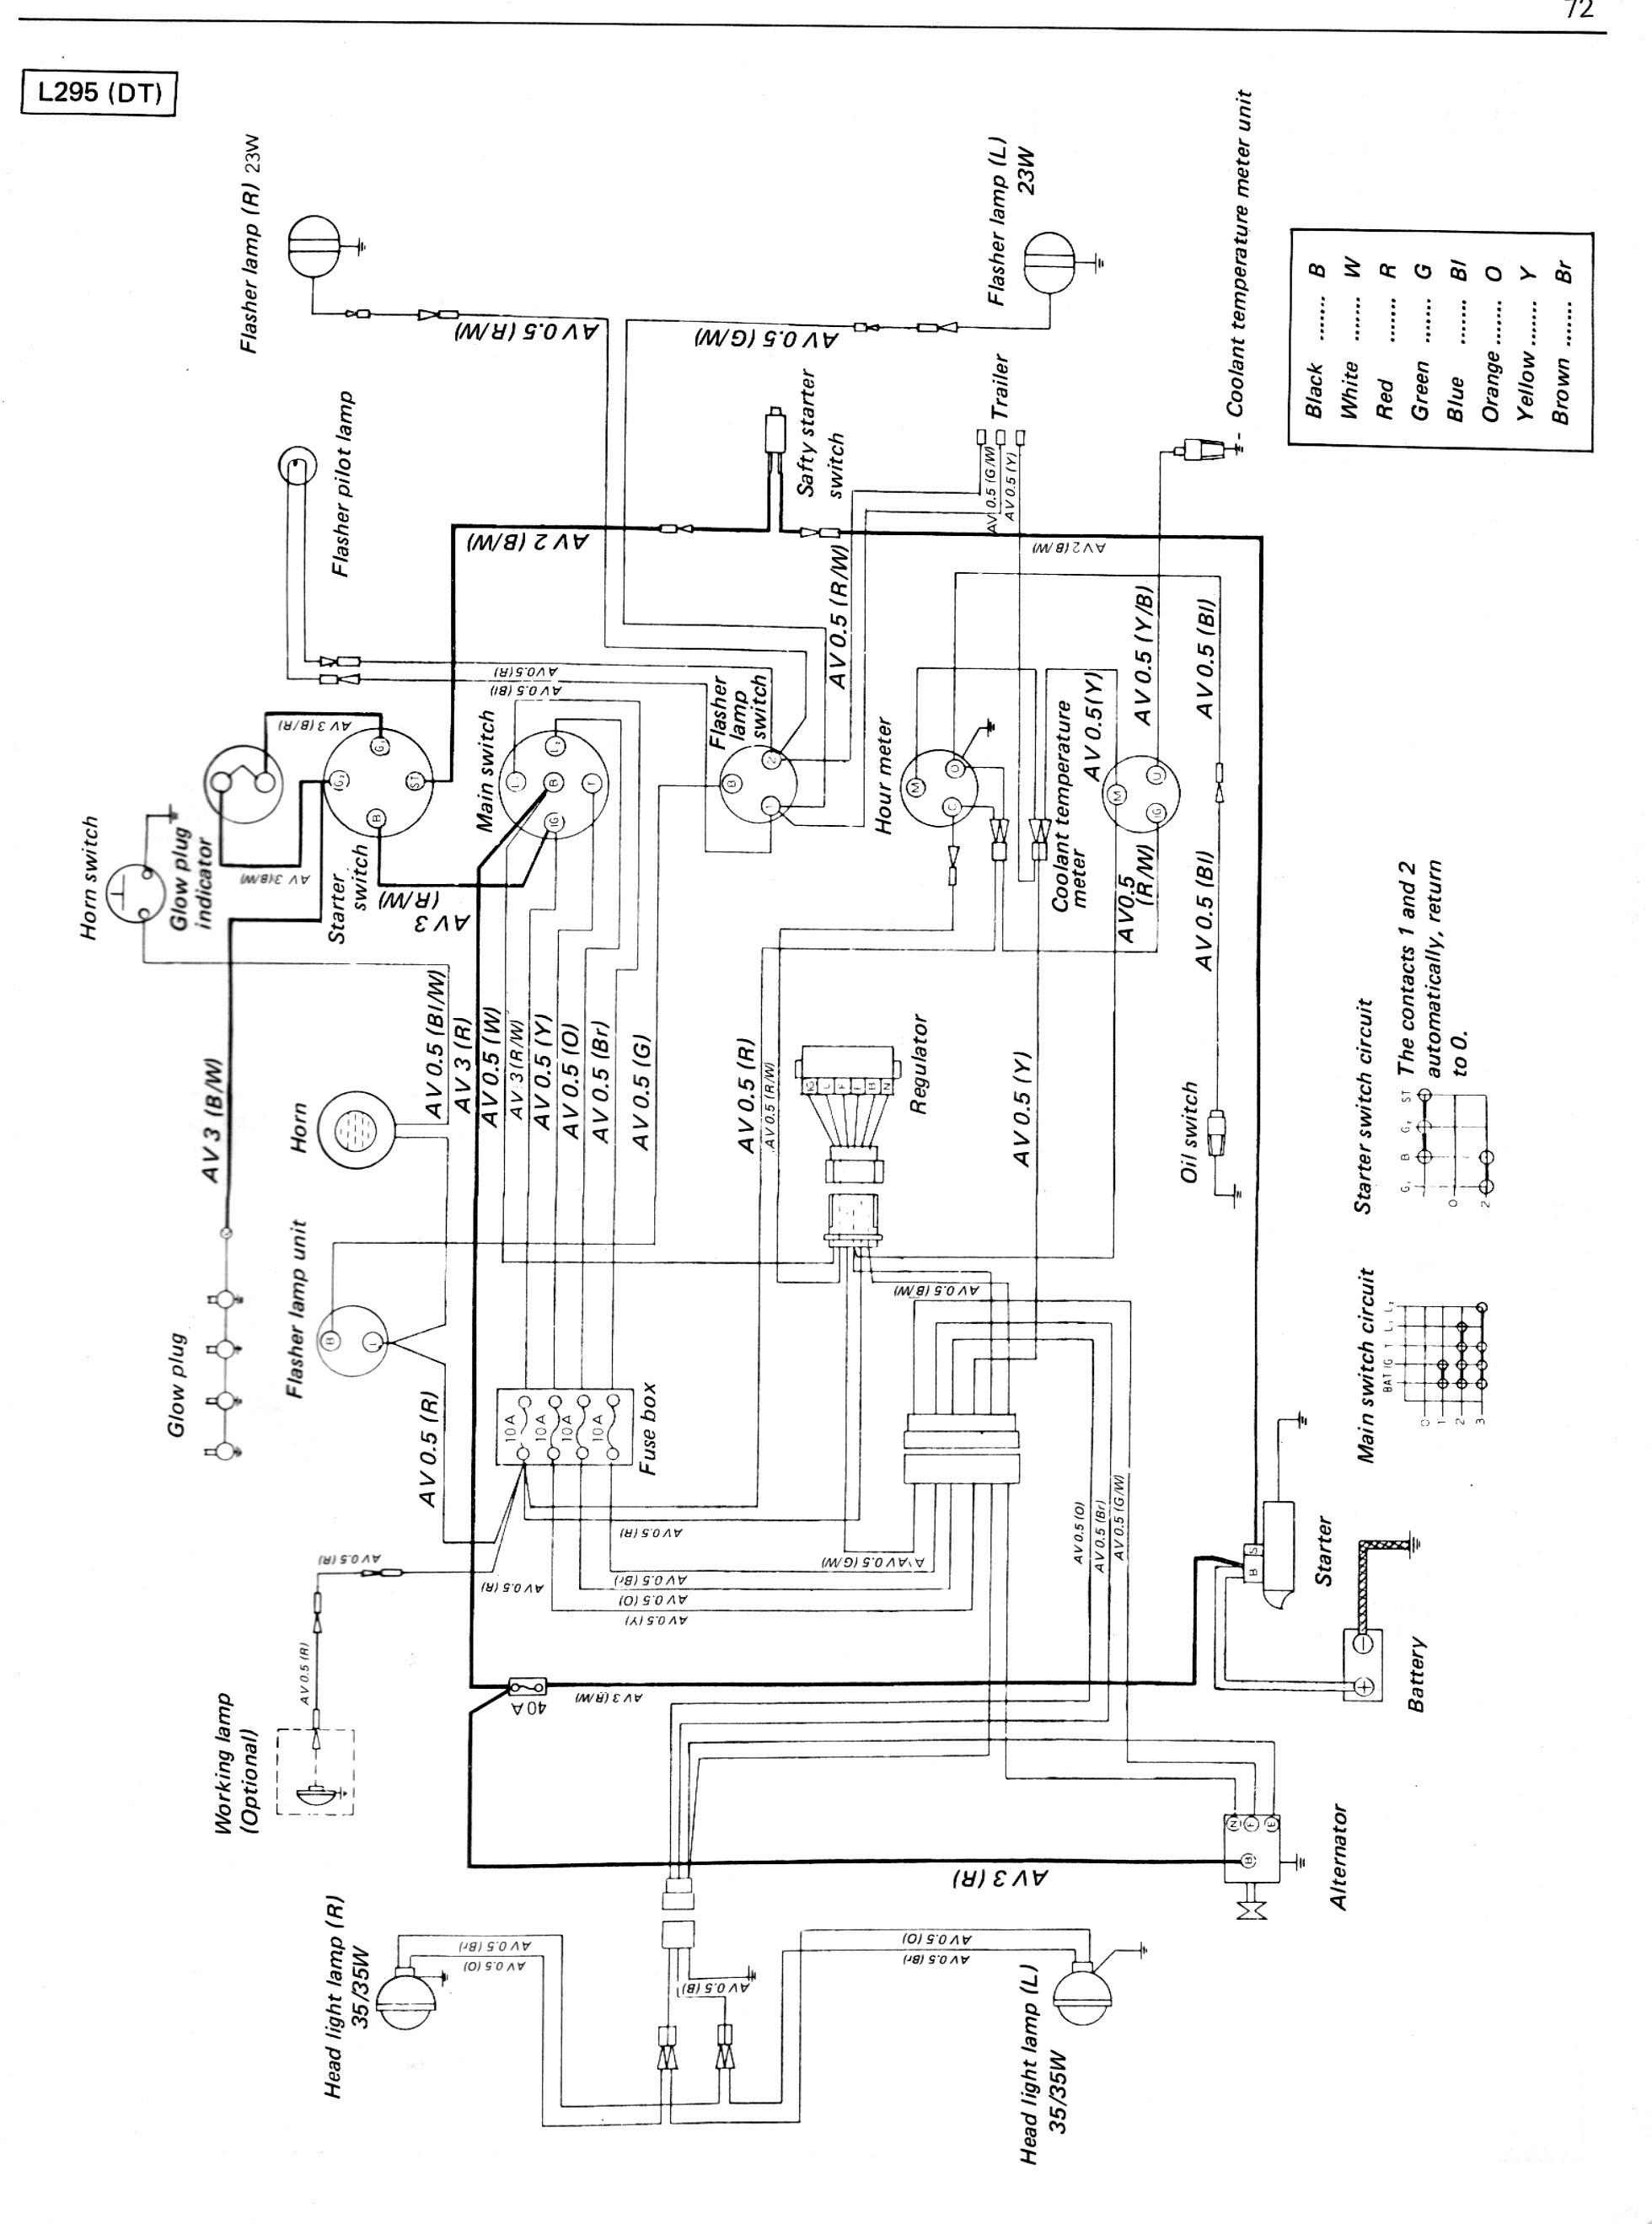 tractor alternator wiring diagram best of